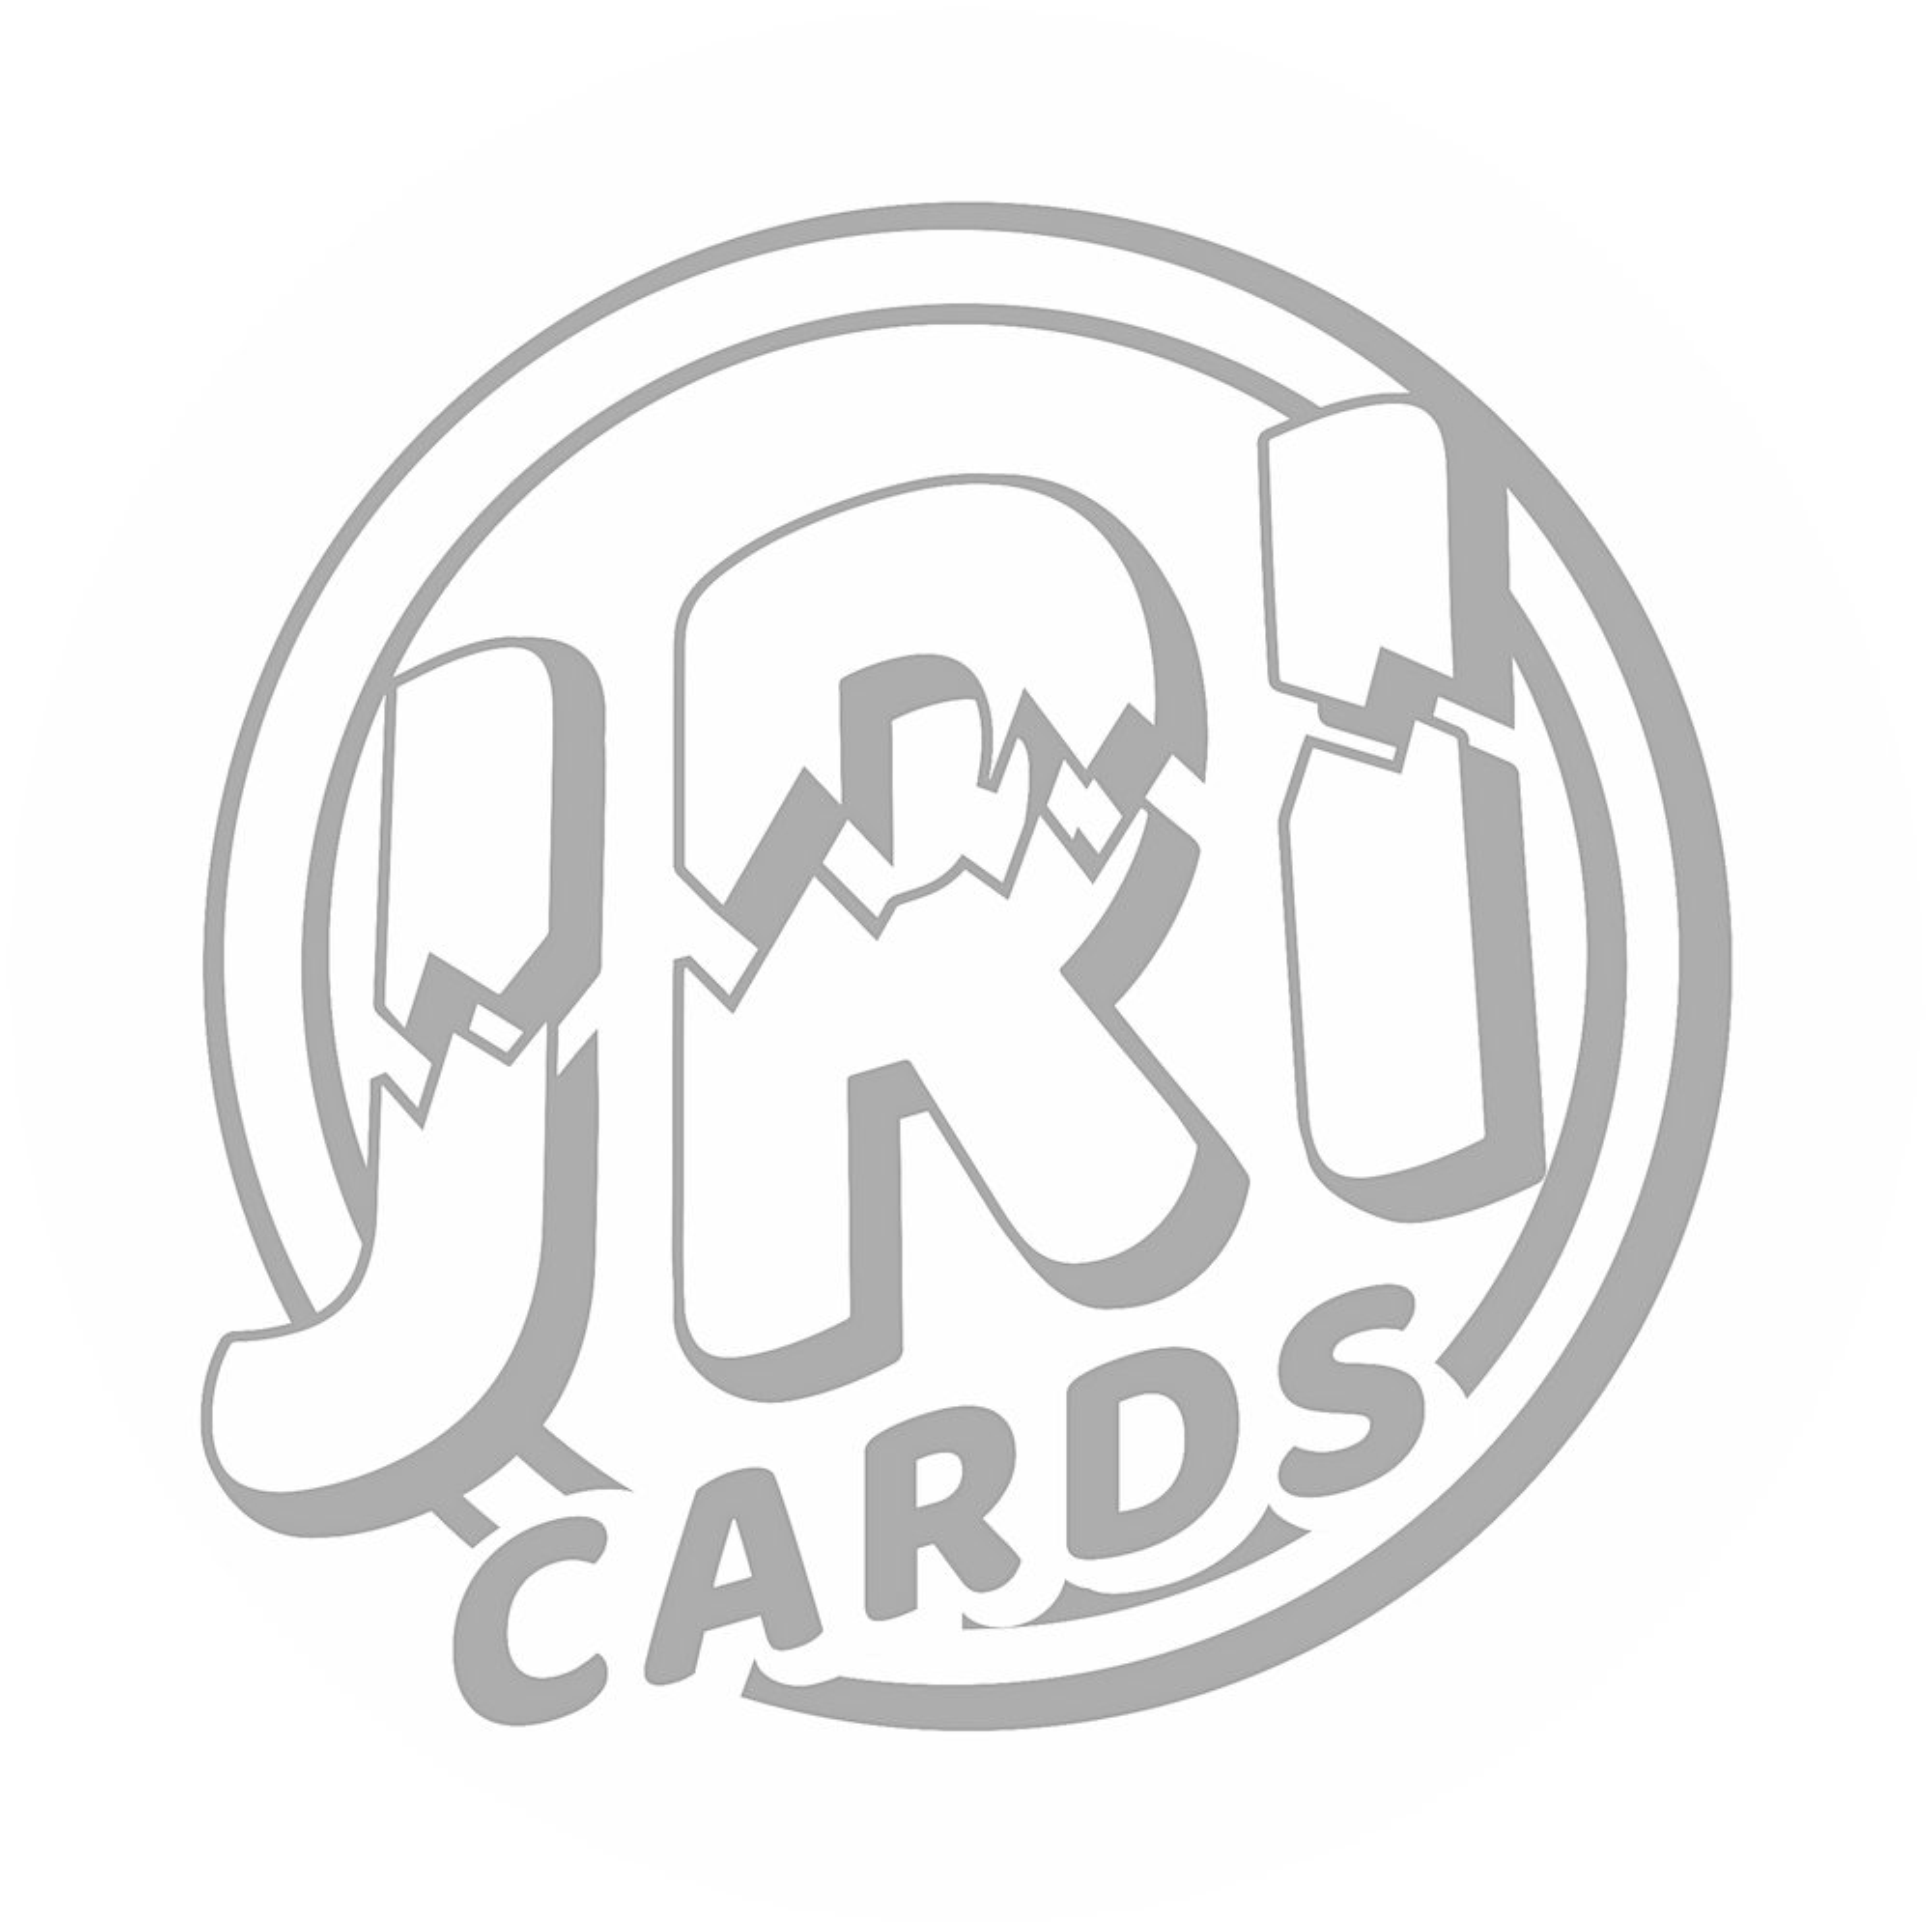 2019 PANINI PRIZM BASKETBALL BLASTER BOX (6 PACKS AVAILABLE)